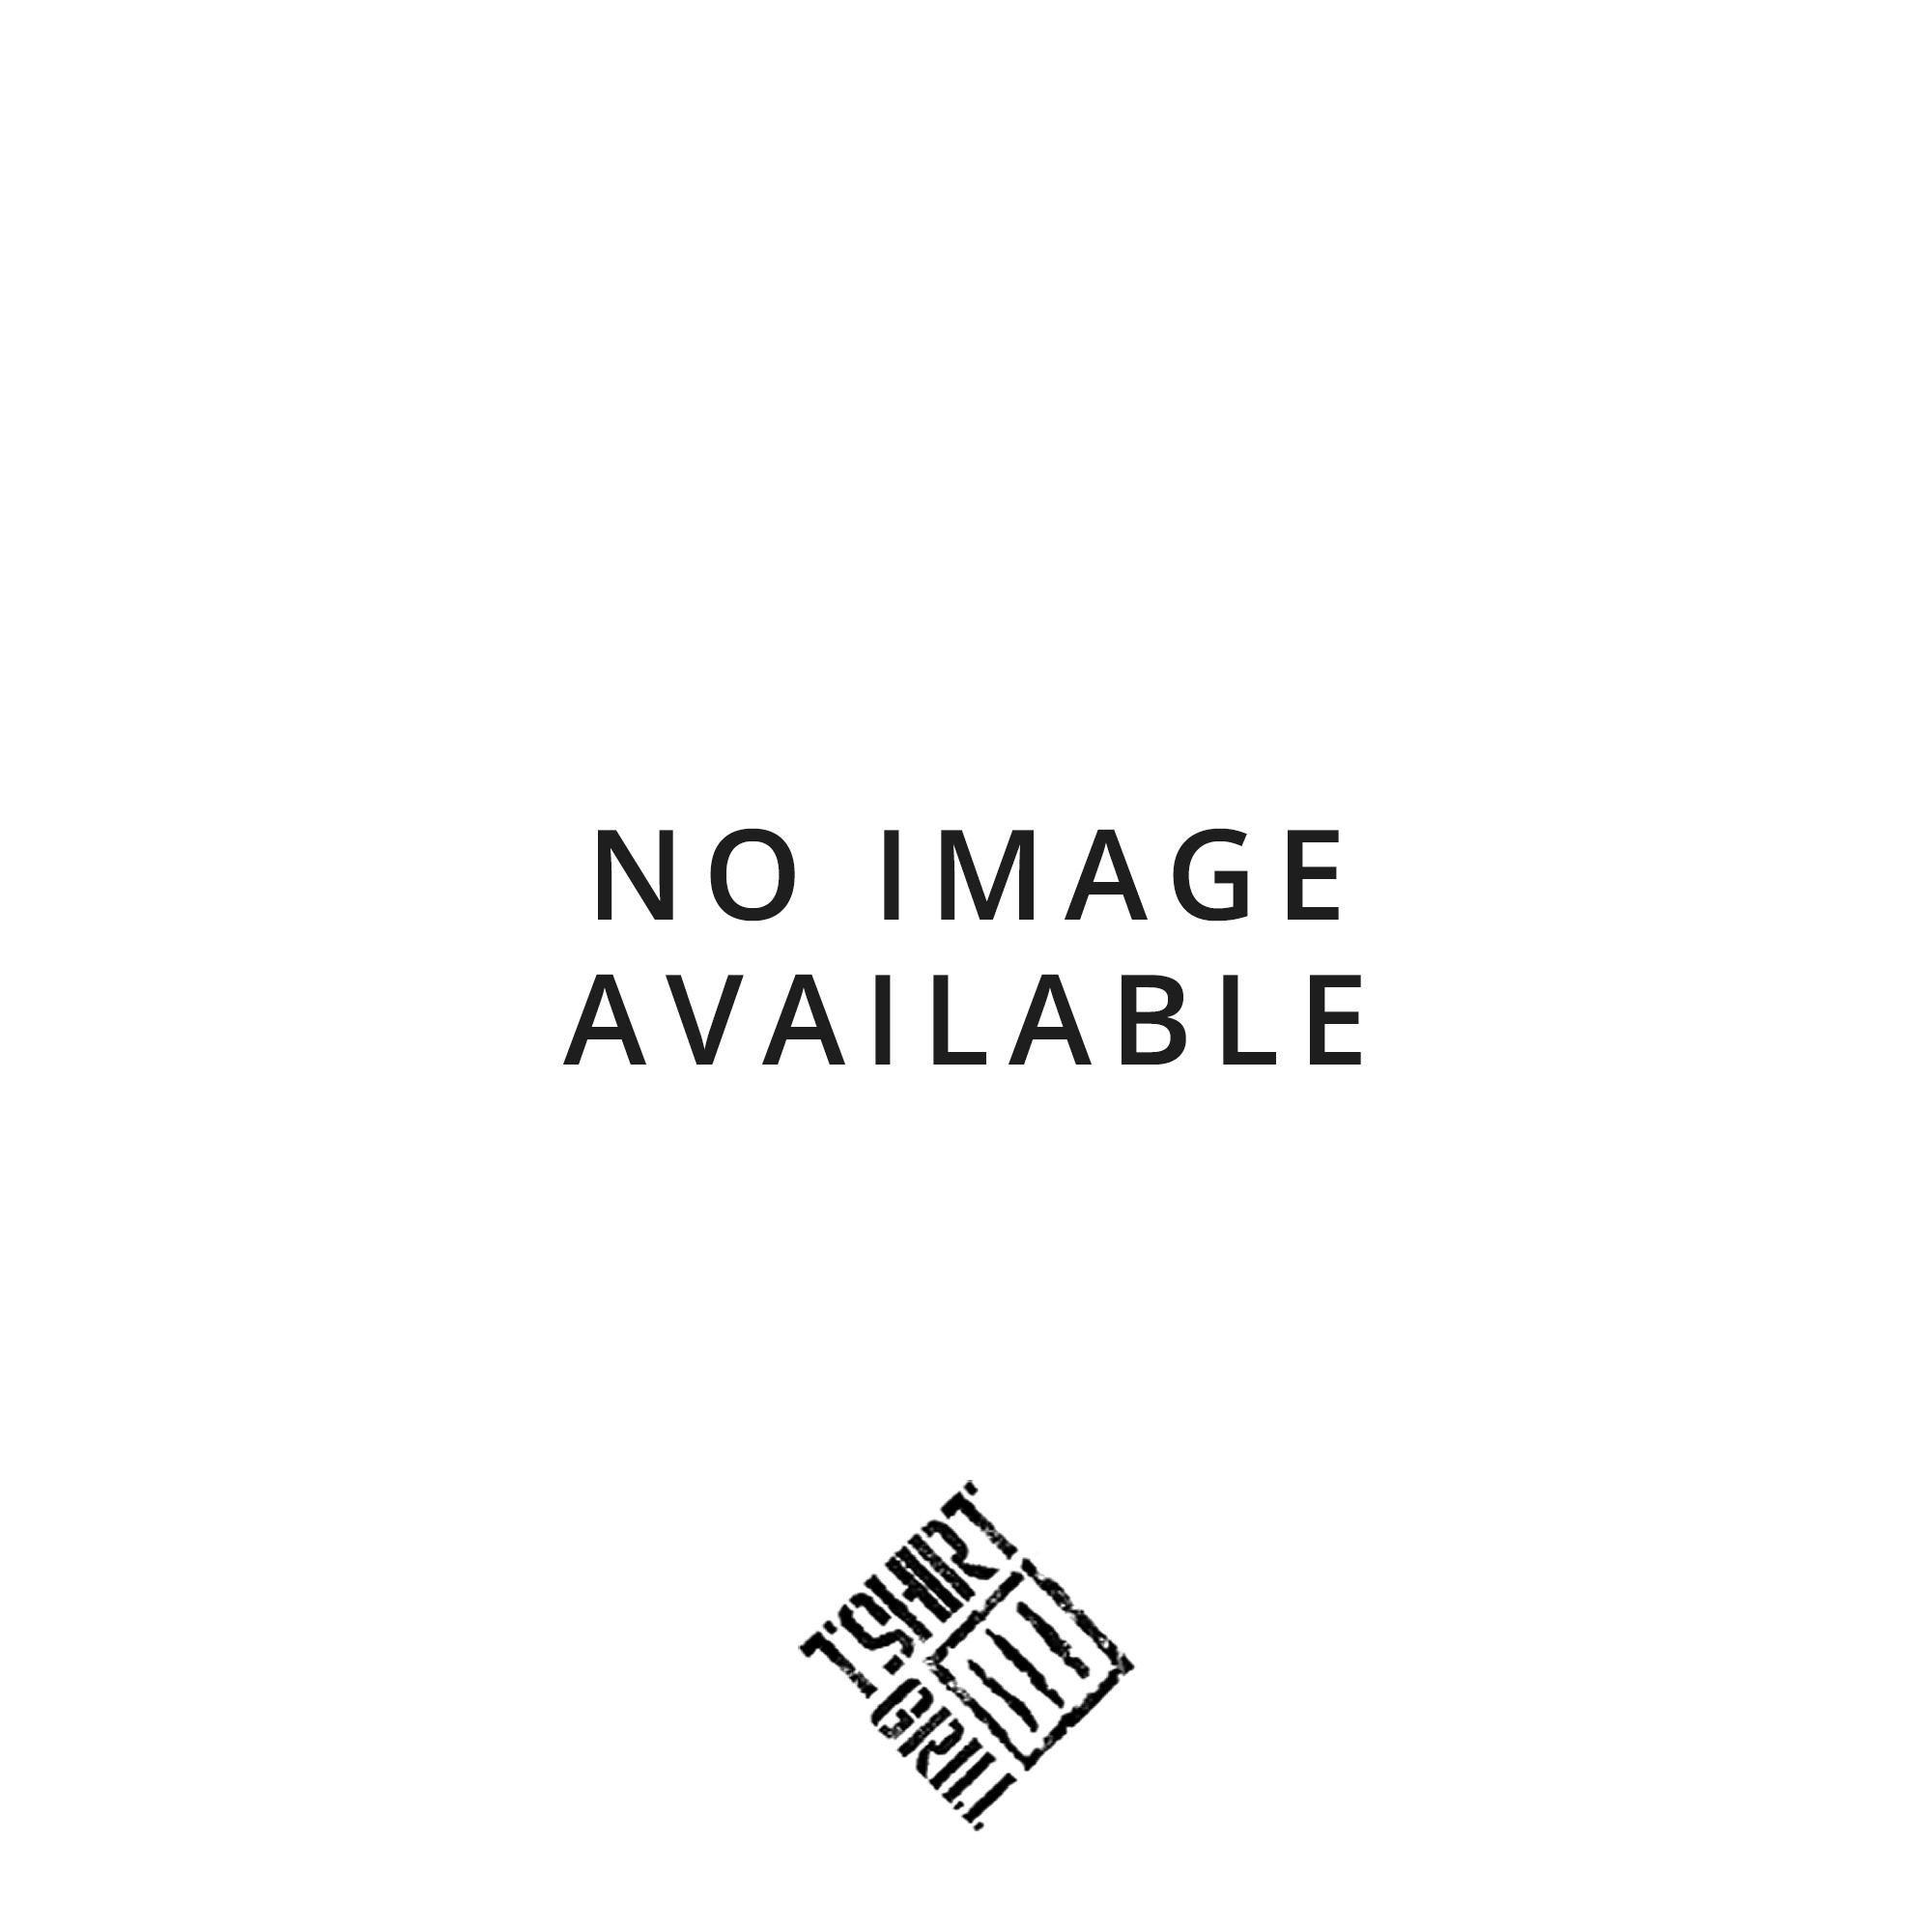 Roadie - Professional Humper T-shirt